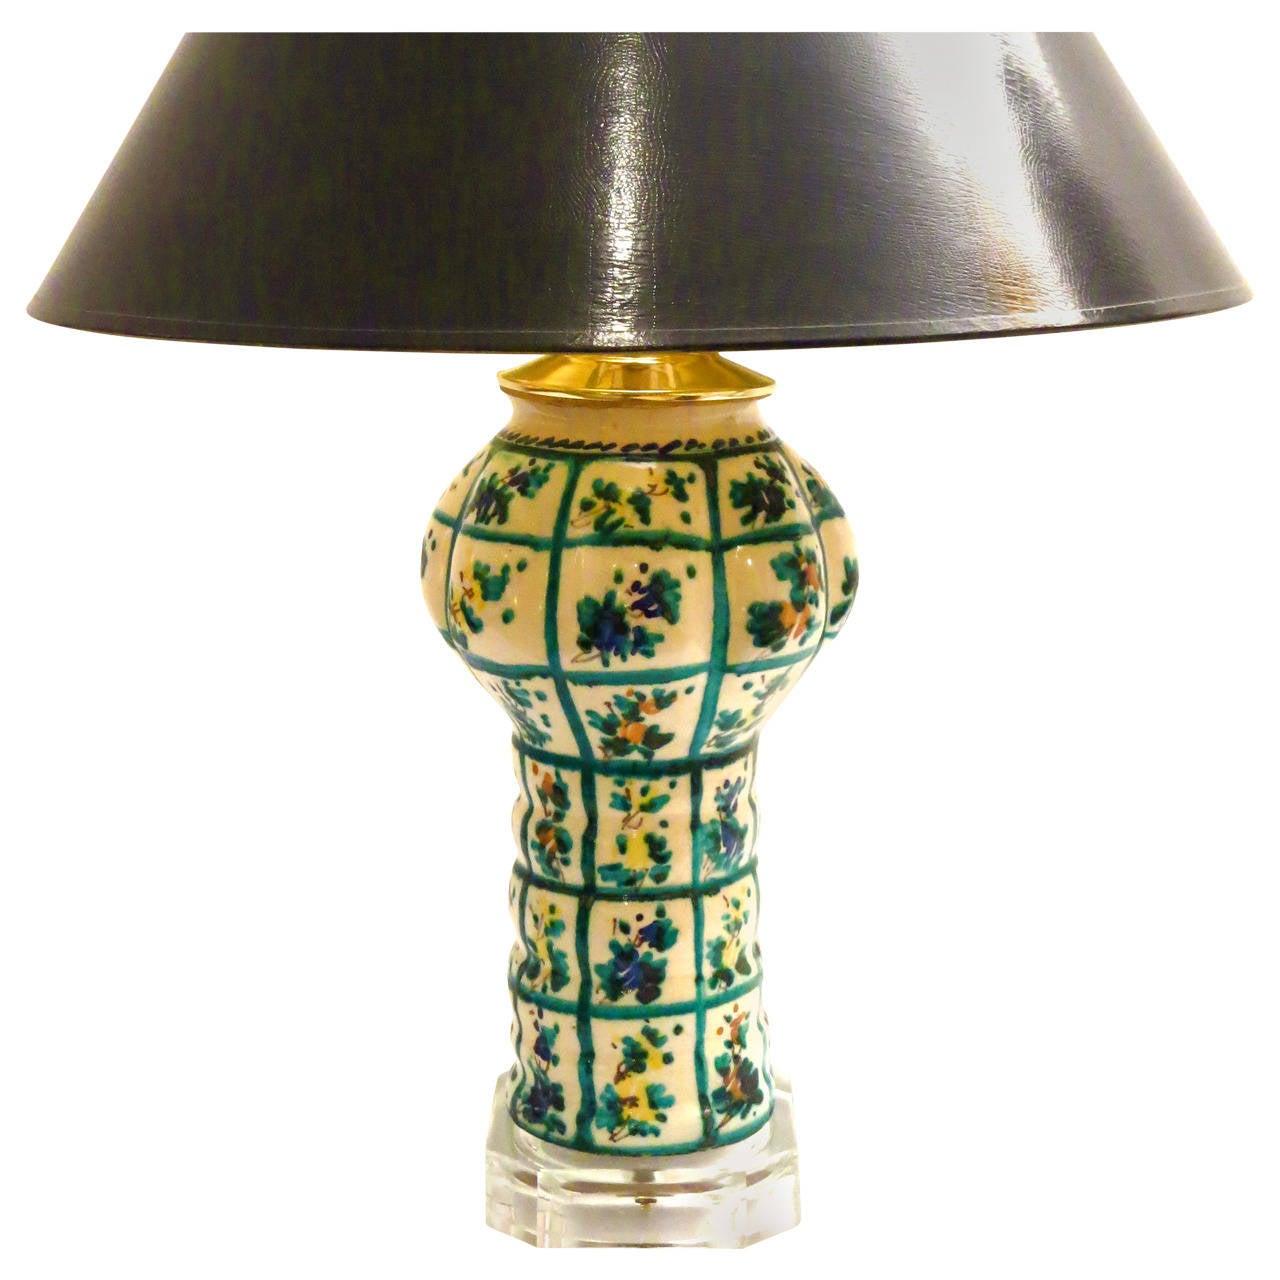 Modern Ceramic Vase Table Lamp: Italian Majolica Hand-Painted Ceramic Vase Lamp Signed By